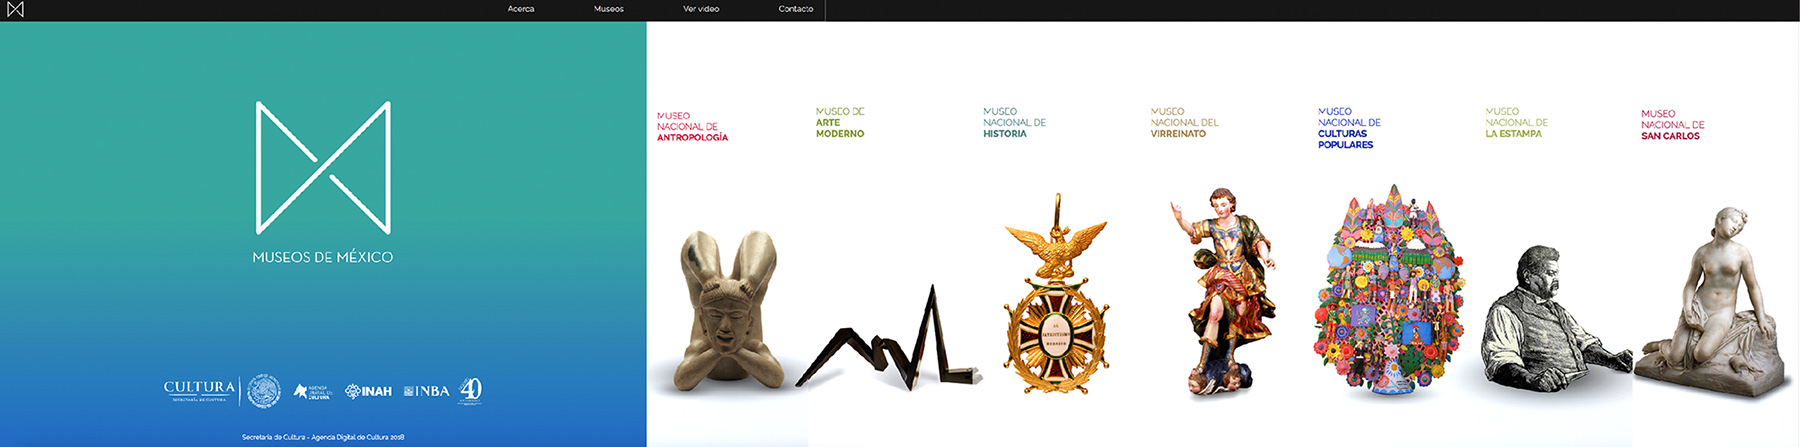 A screenshot of the main page of Museos de México